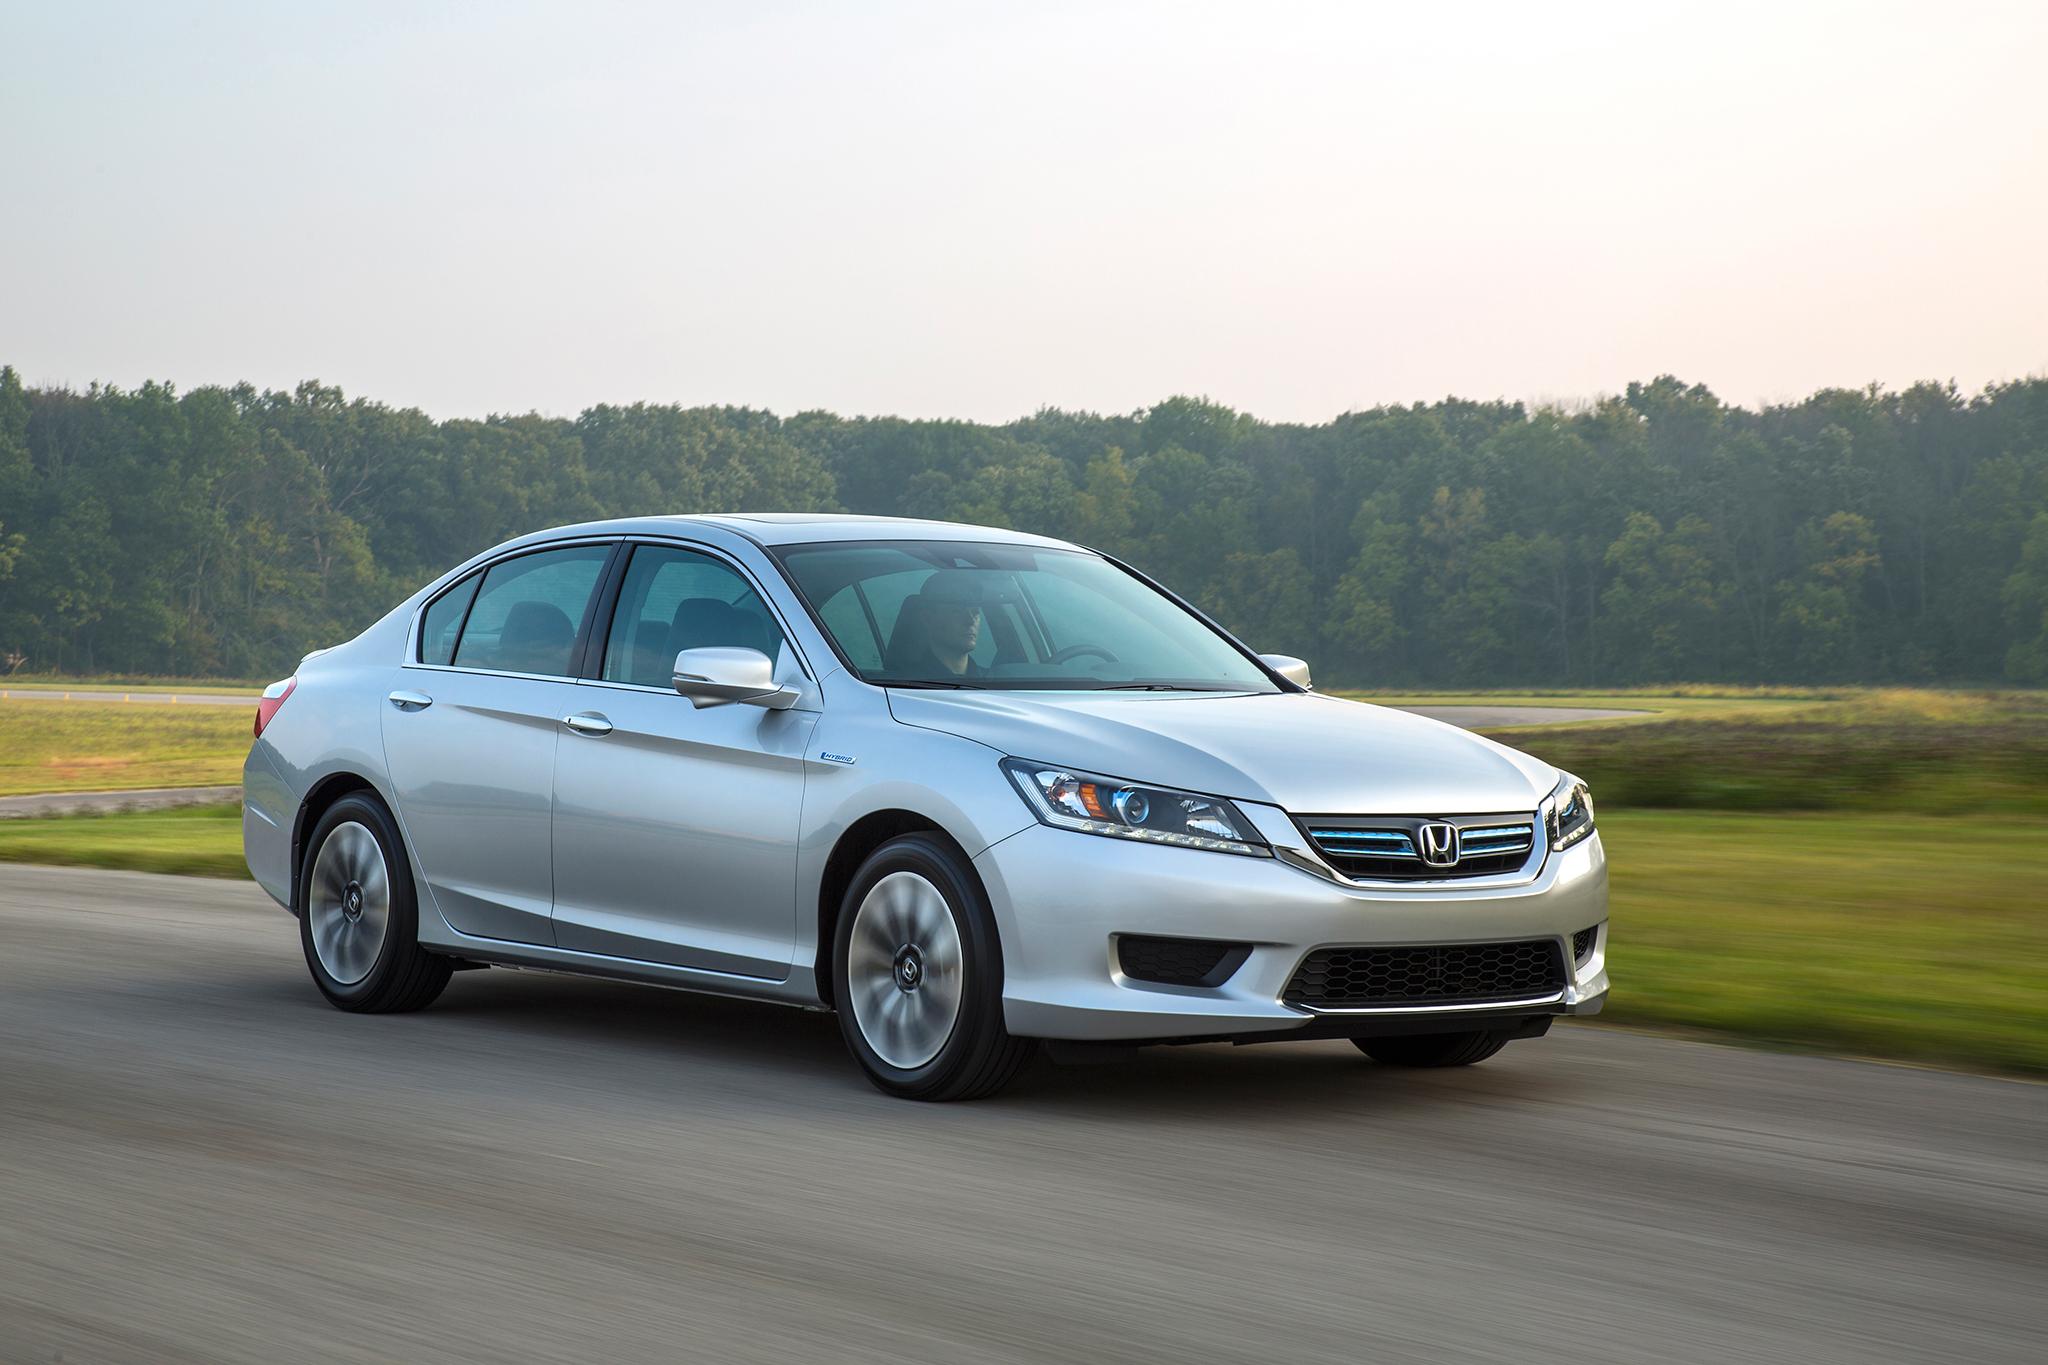 2014 Honda Accord Hybrid EX L Passengers Three Quarters In Motion